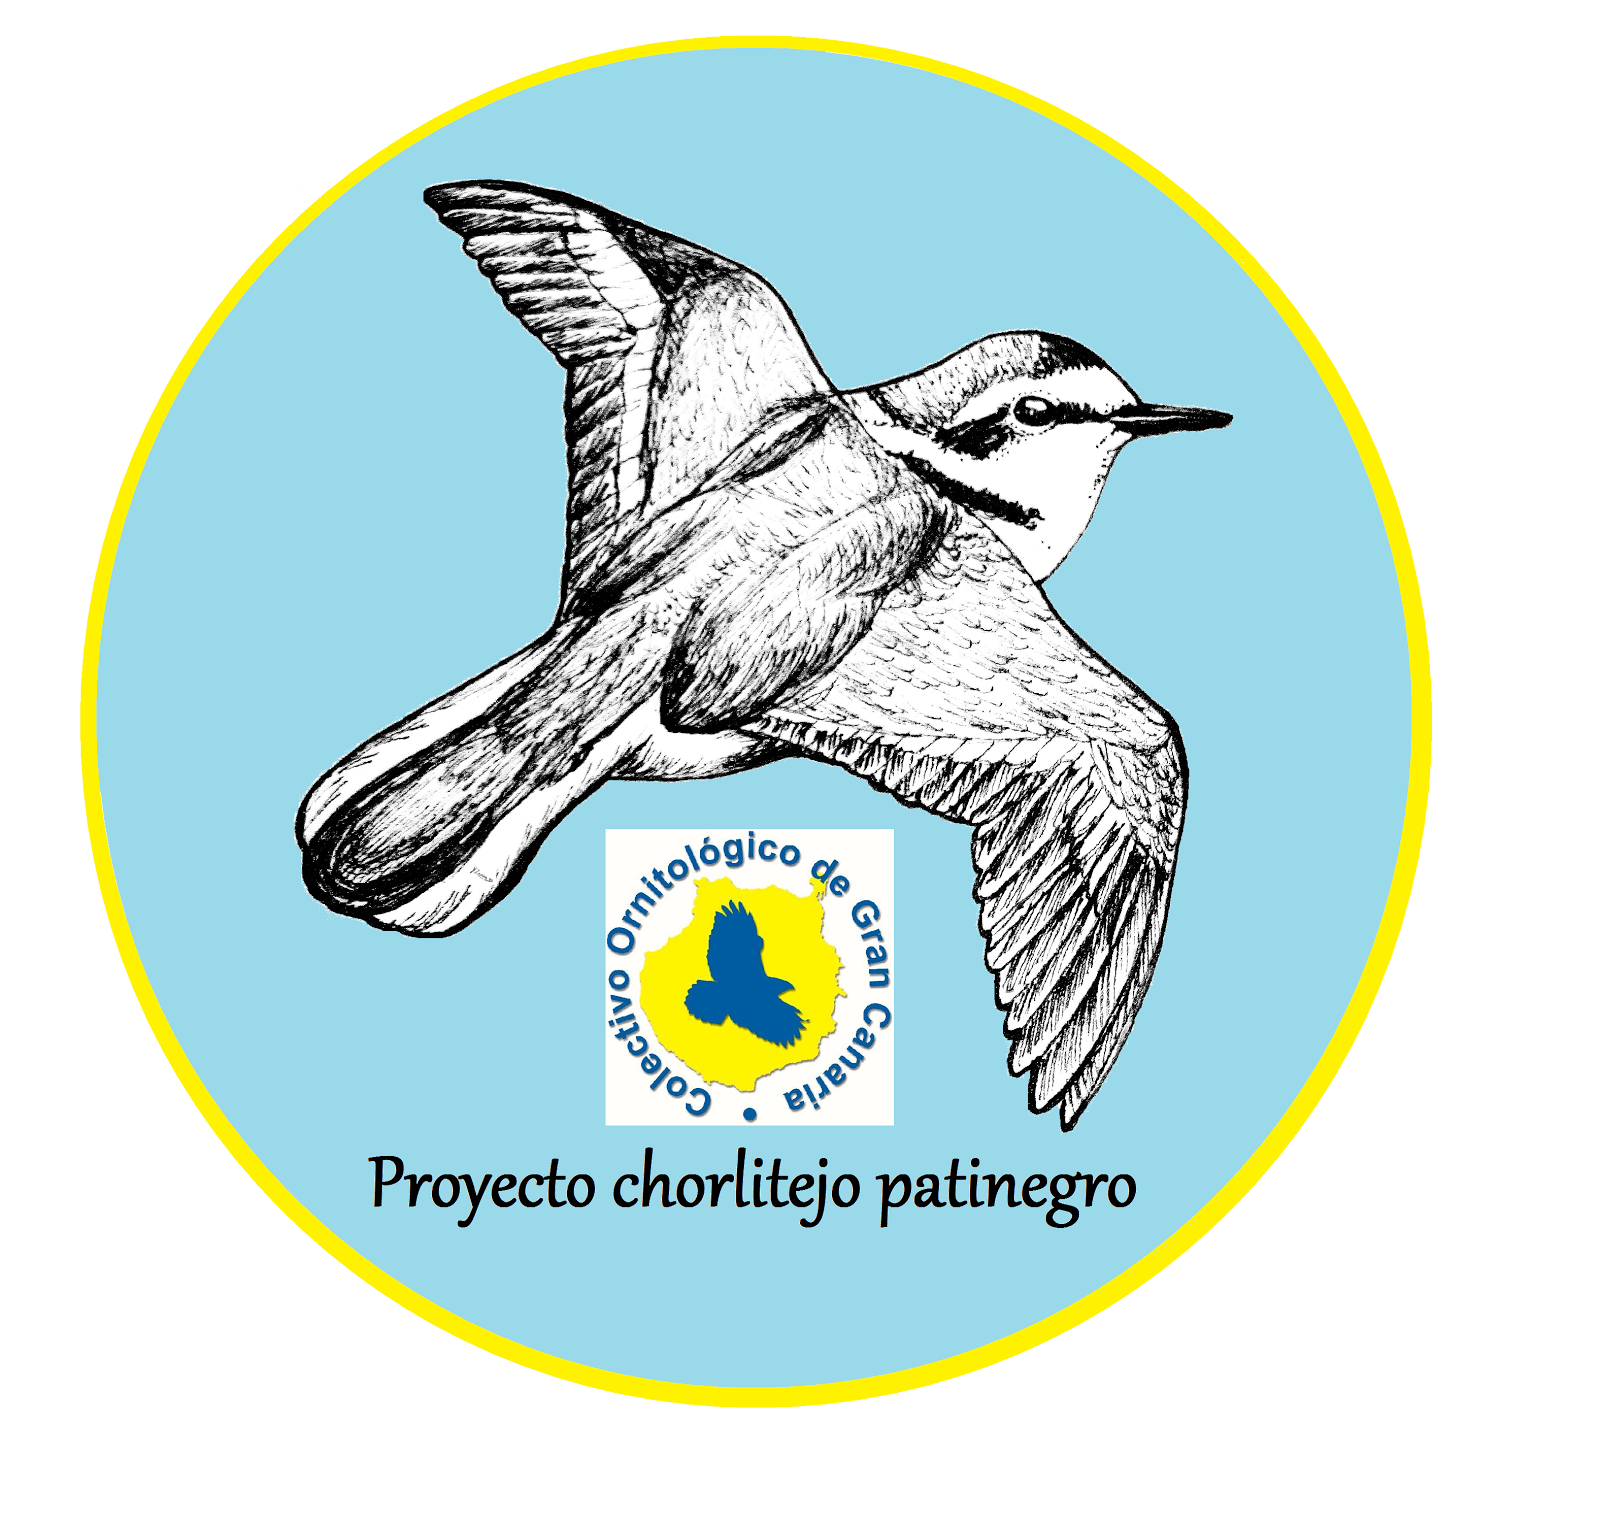 Proyecto chorlitejo patinegro